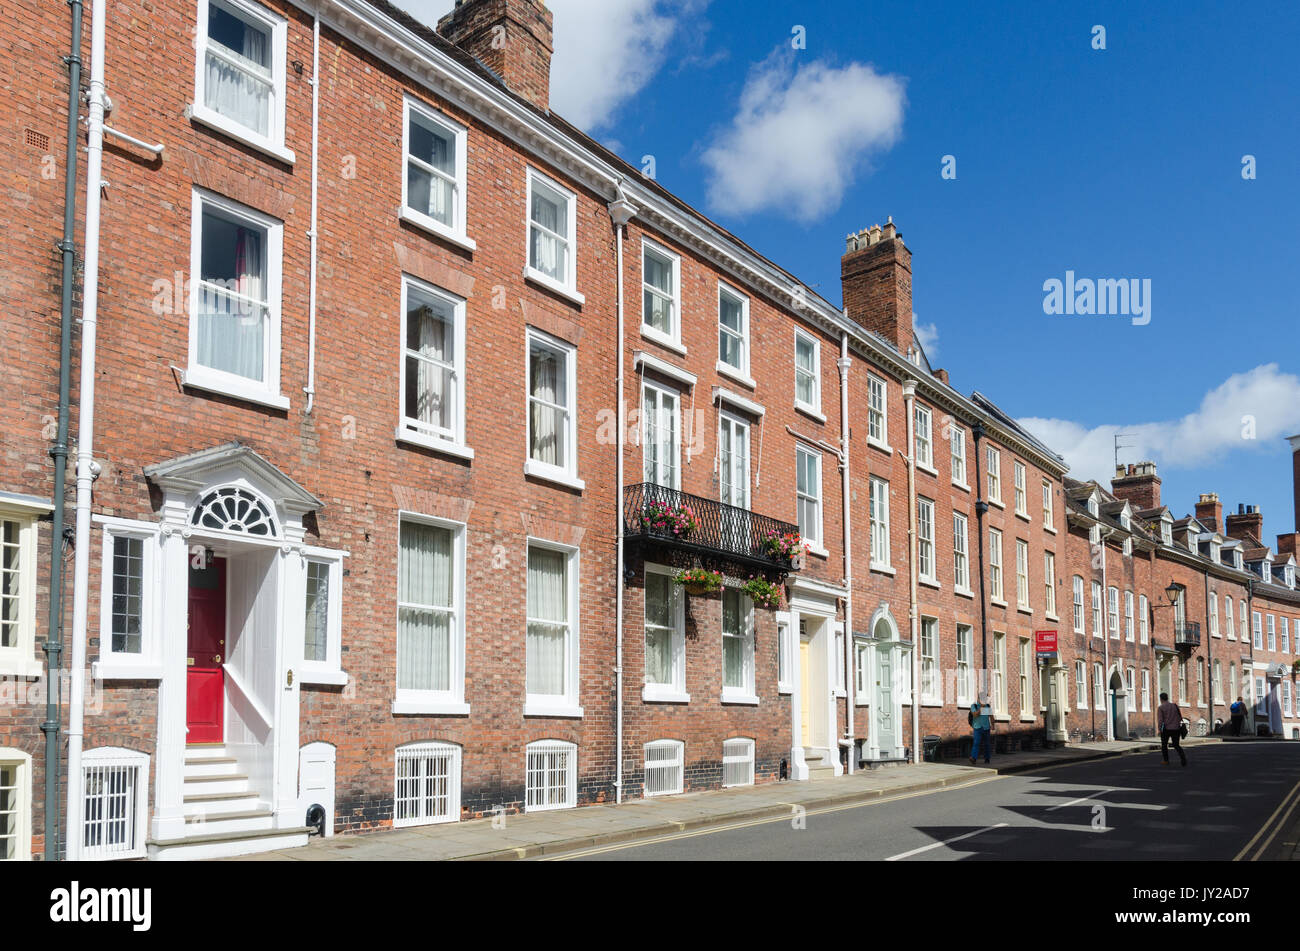 Tall Georgian houses in St John's Hill in Shrewsbury, Shropshire - Stock Image